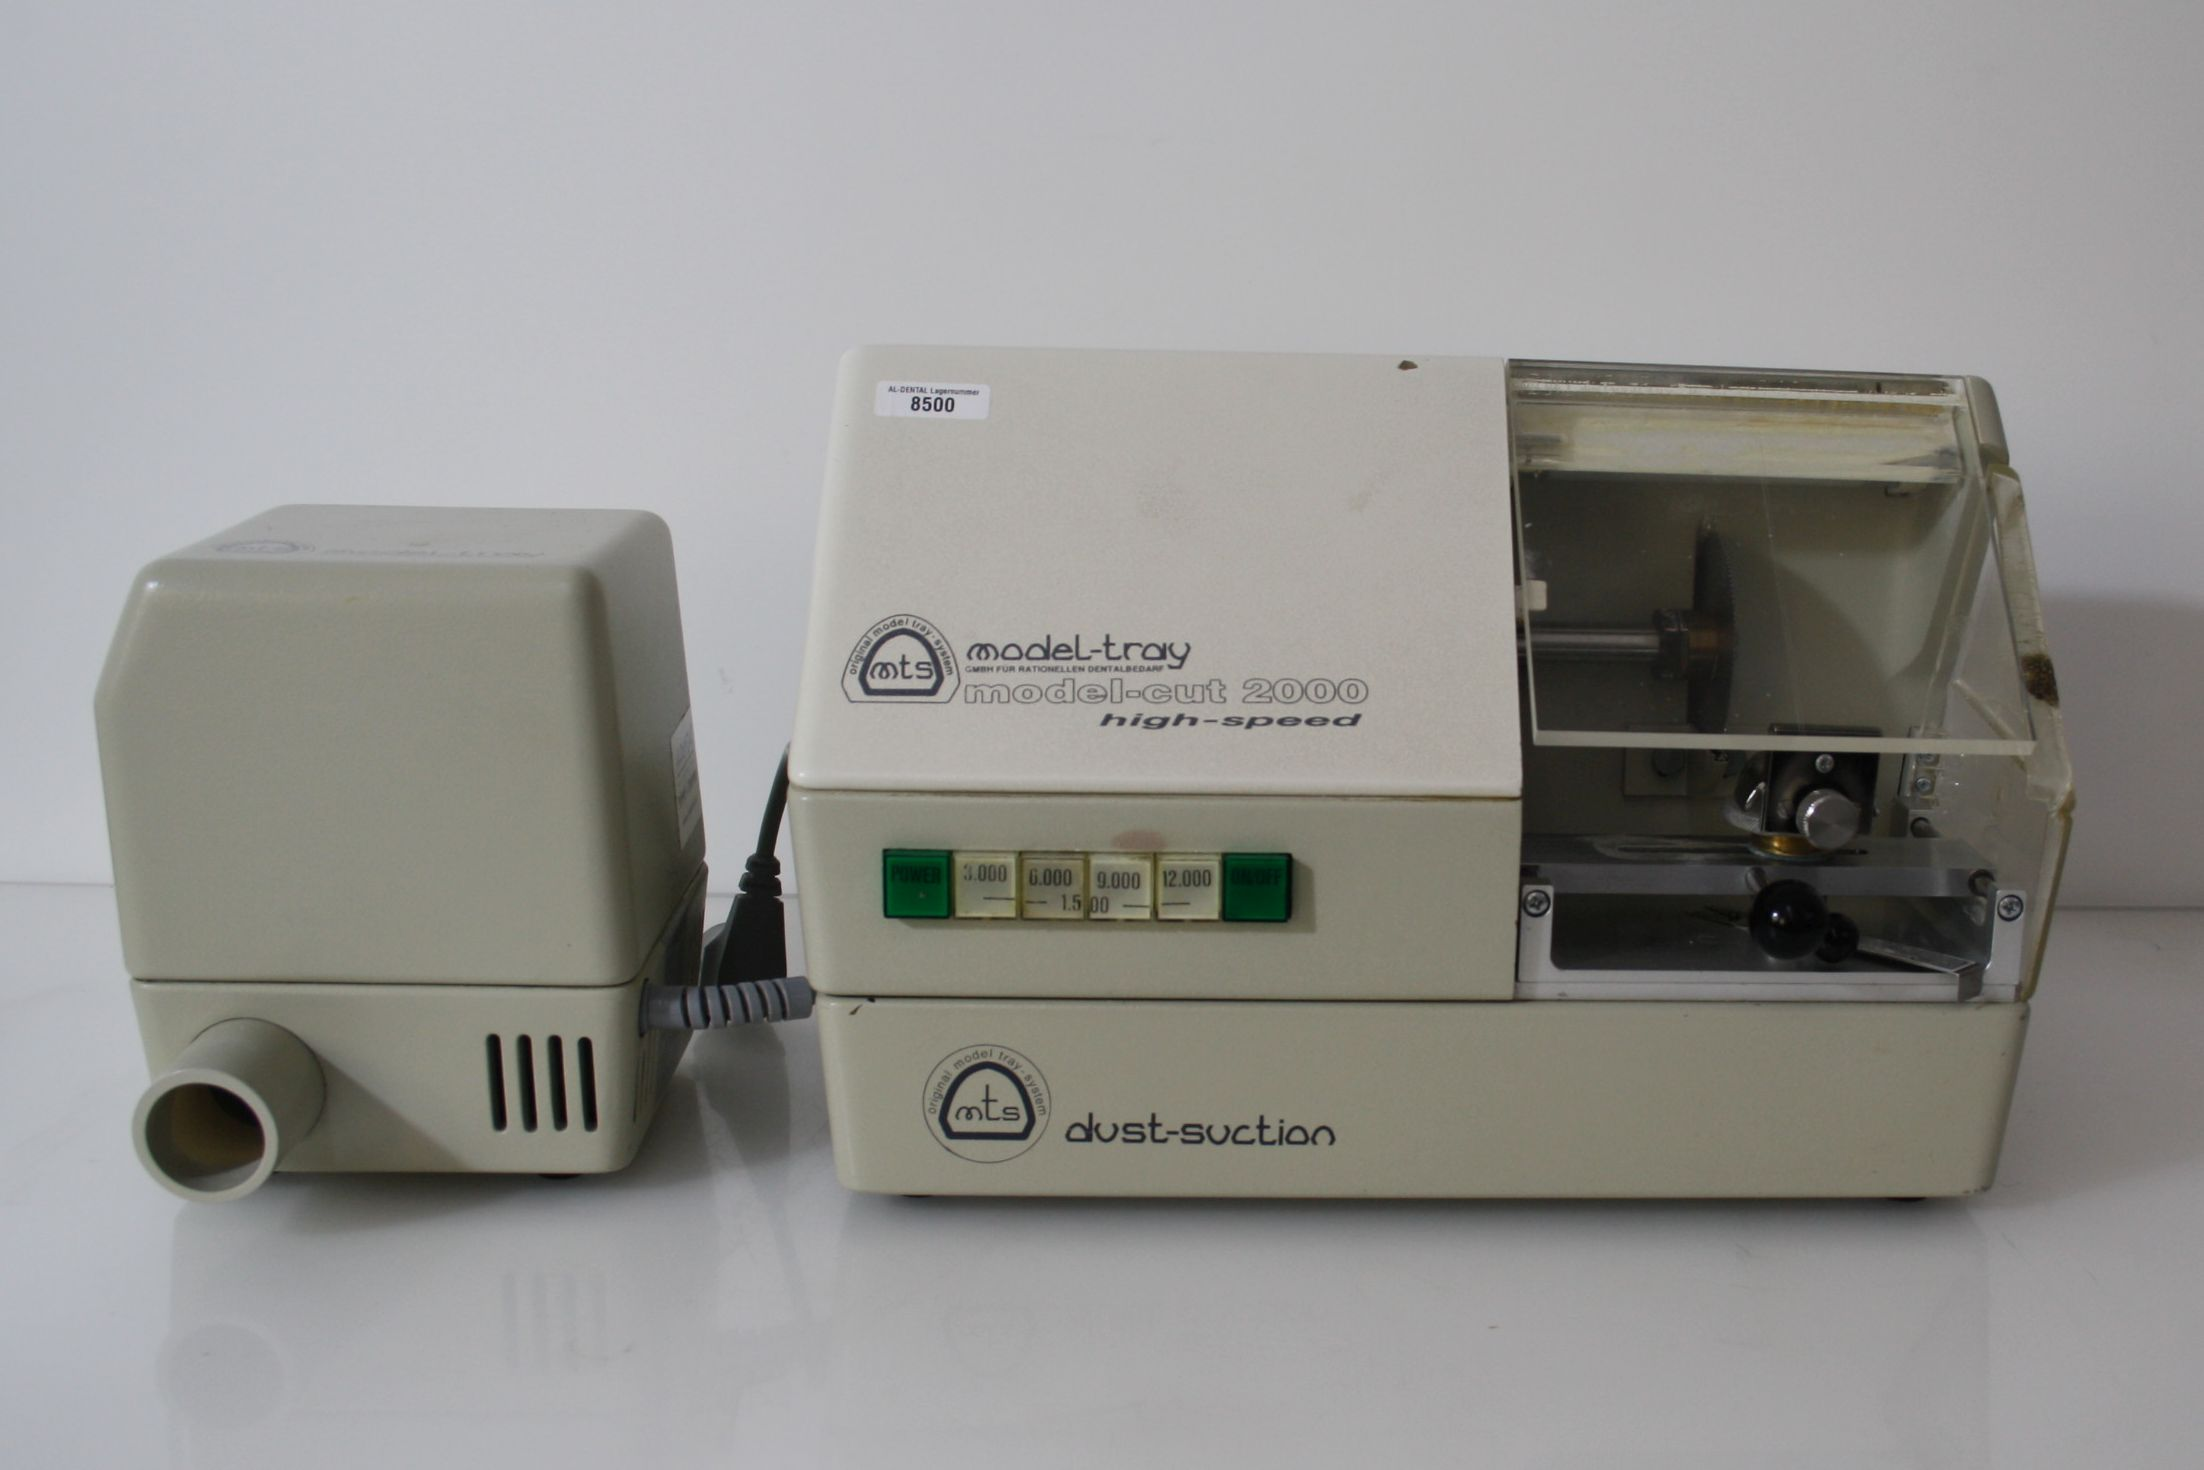 Modellsäge model-cut 2000 high-speed Model-tray + Dust-suction # 8500